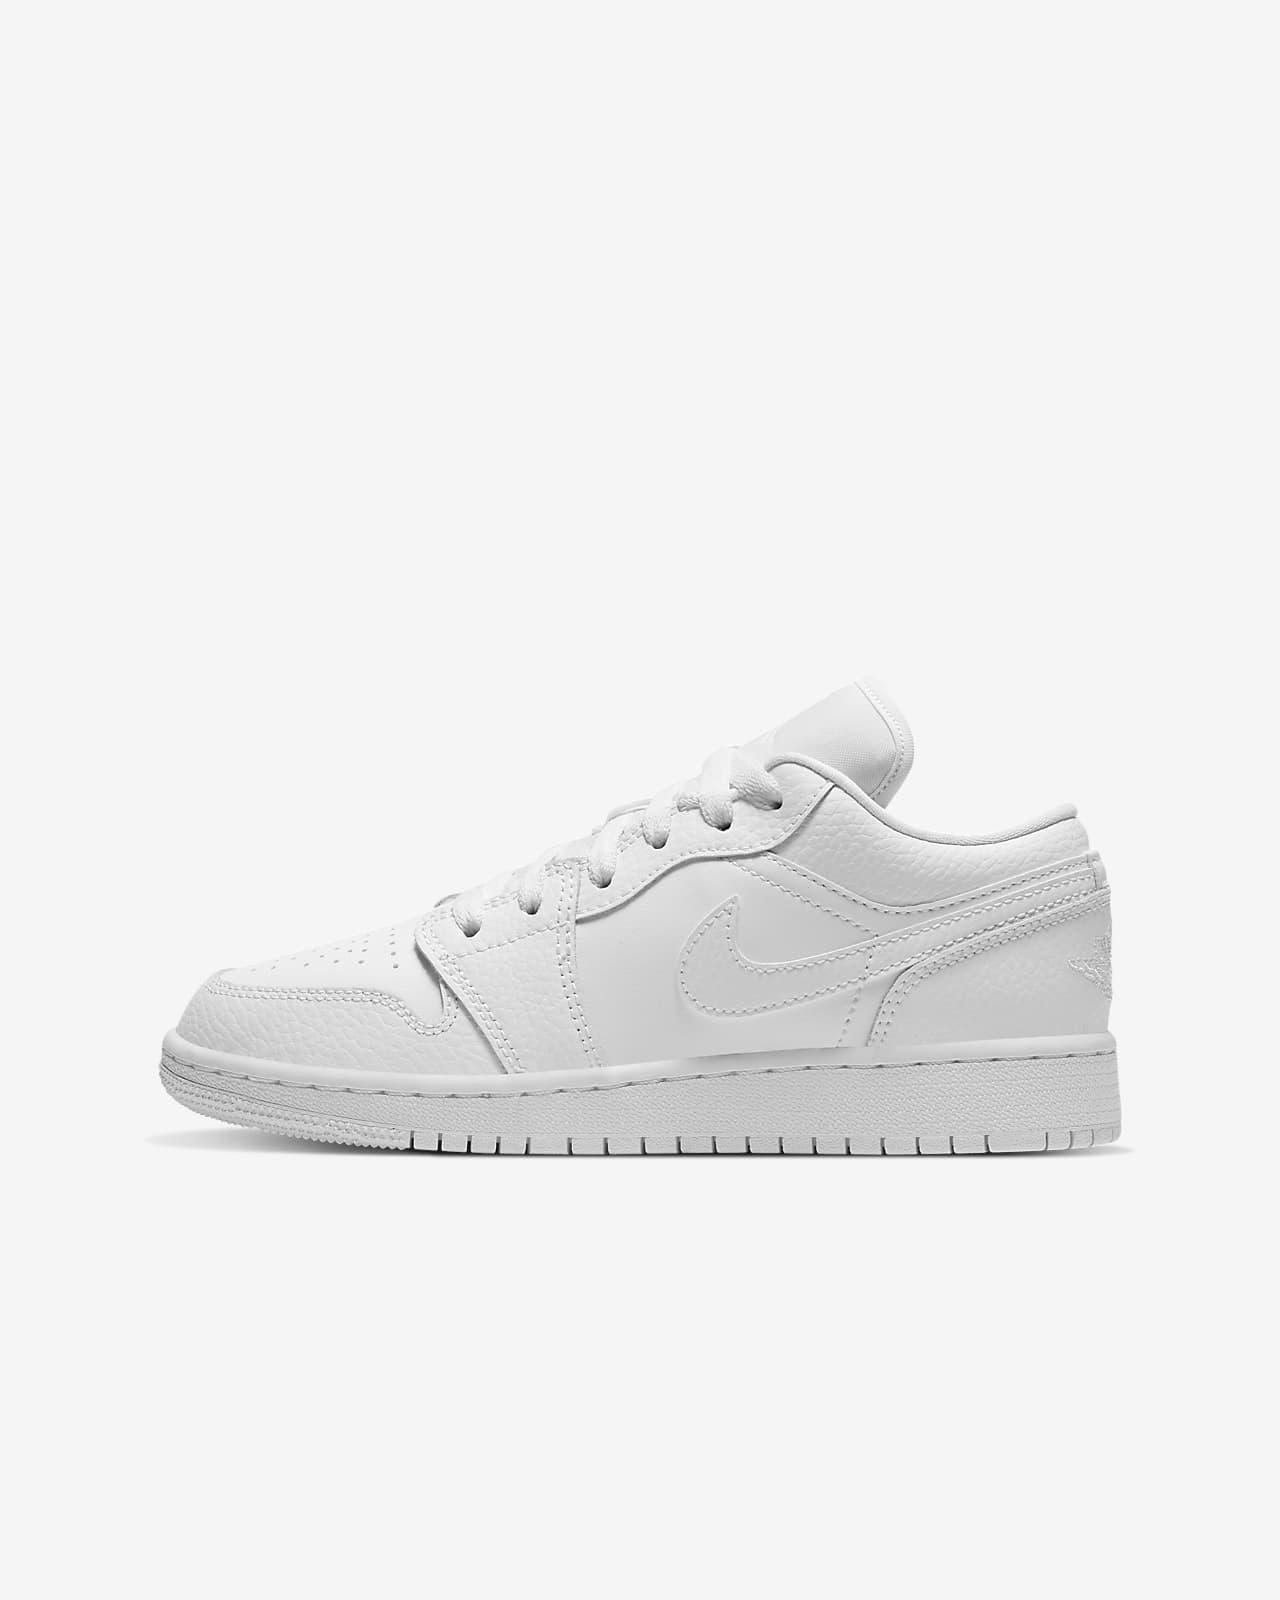 Air Jordan 1 Low-sko til store børn